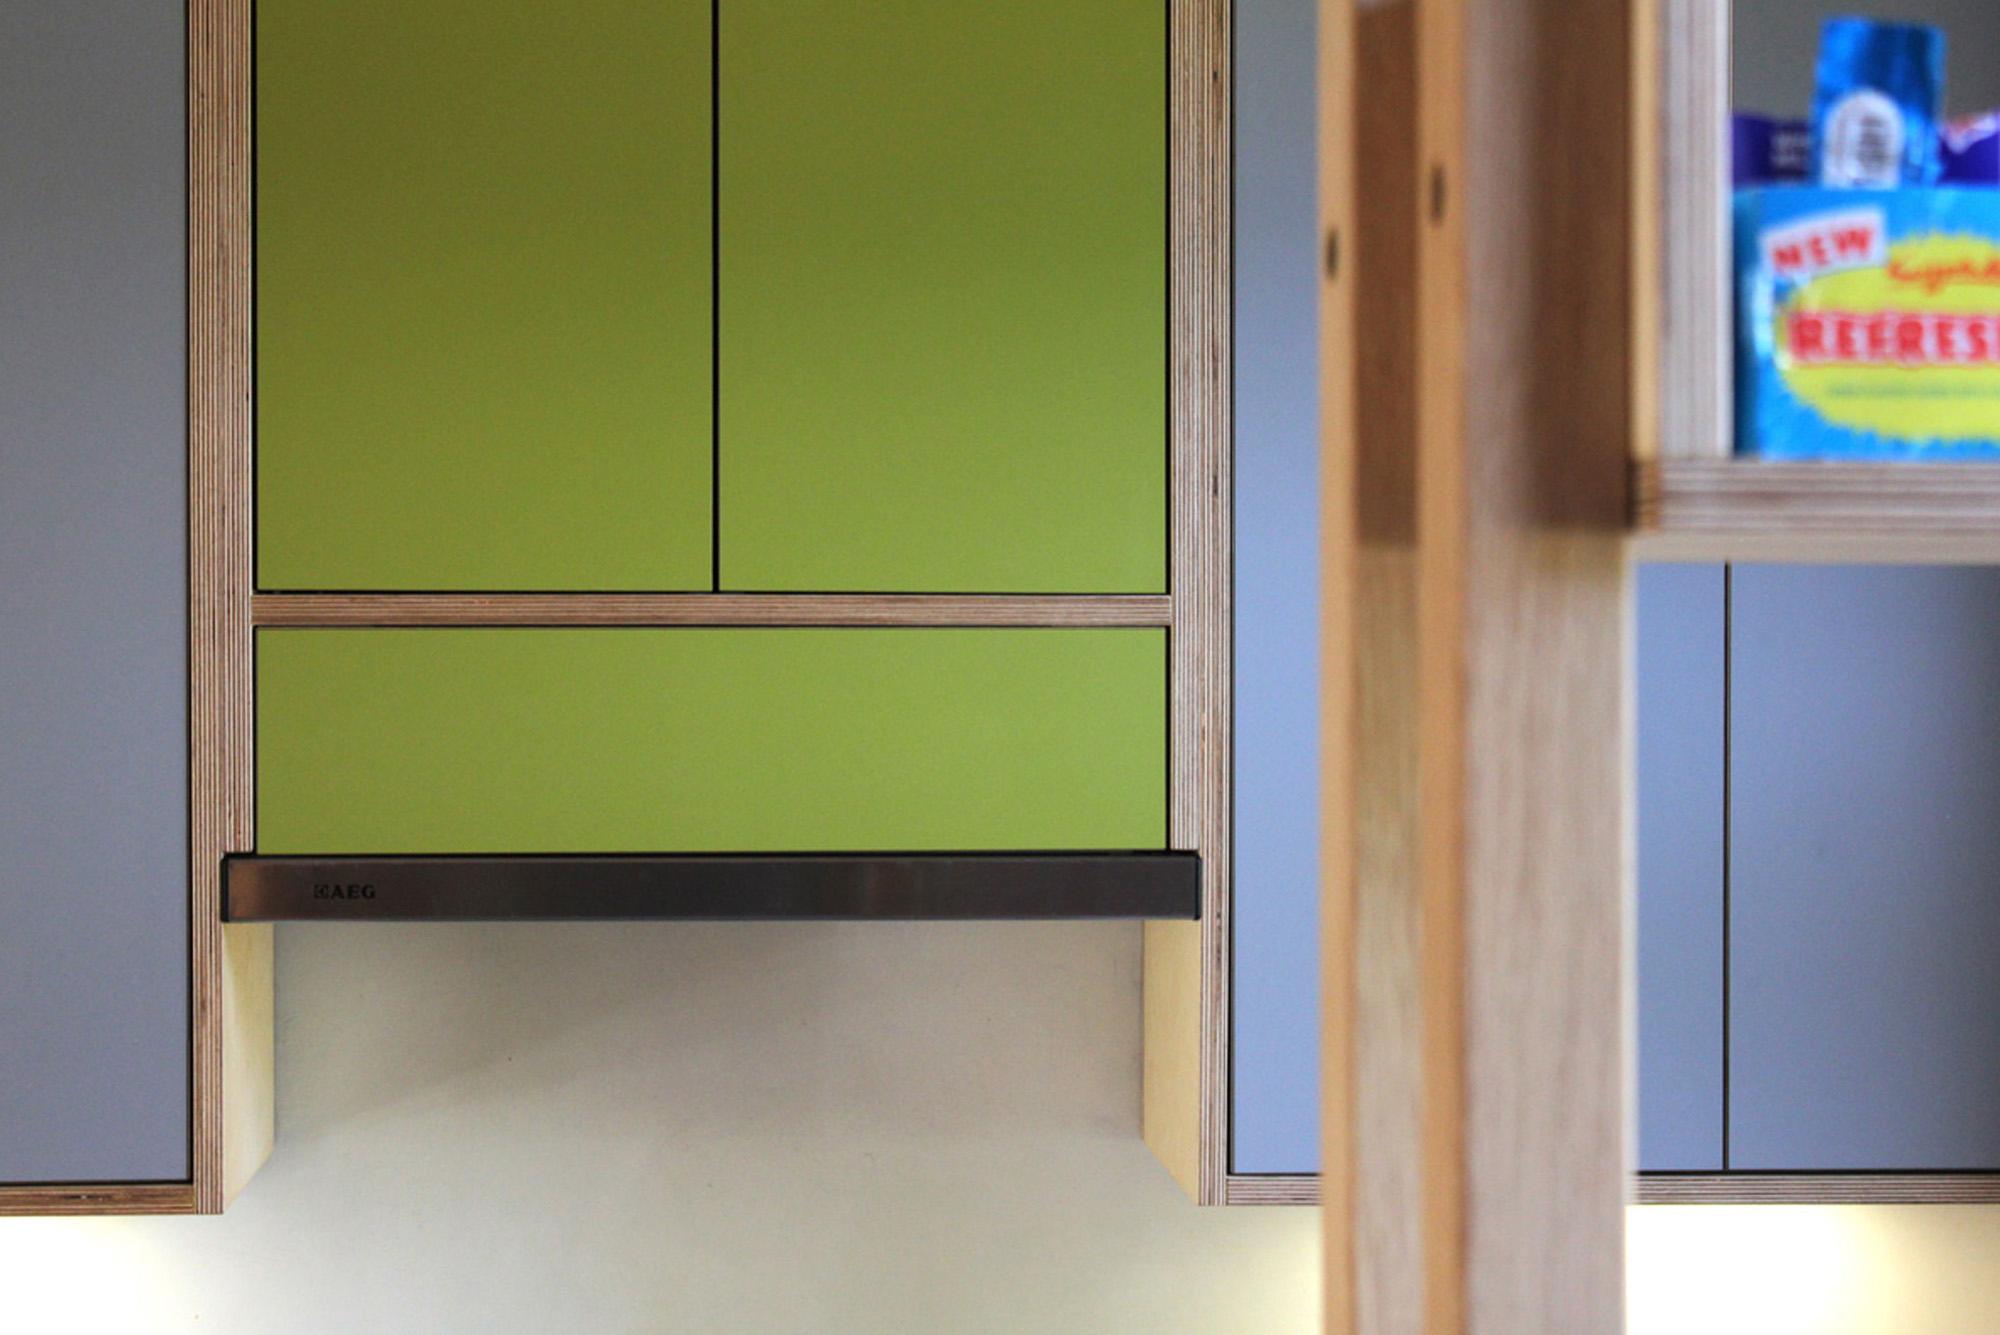 Green & grey kitchen extractor housing